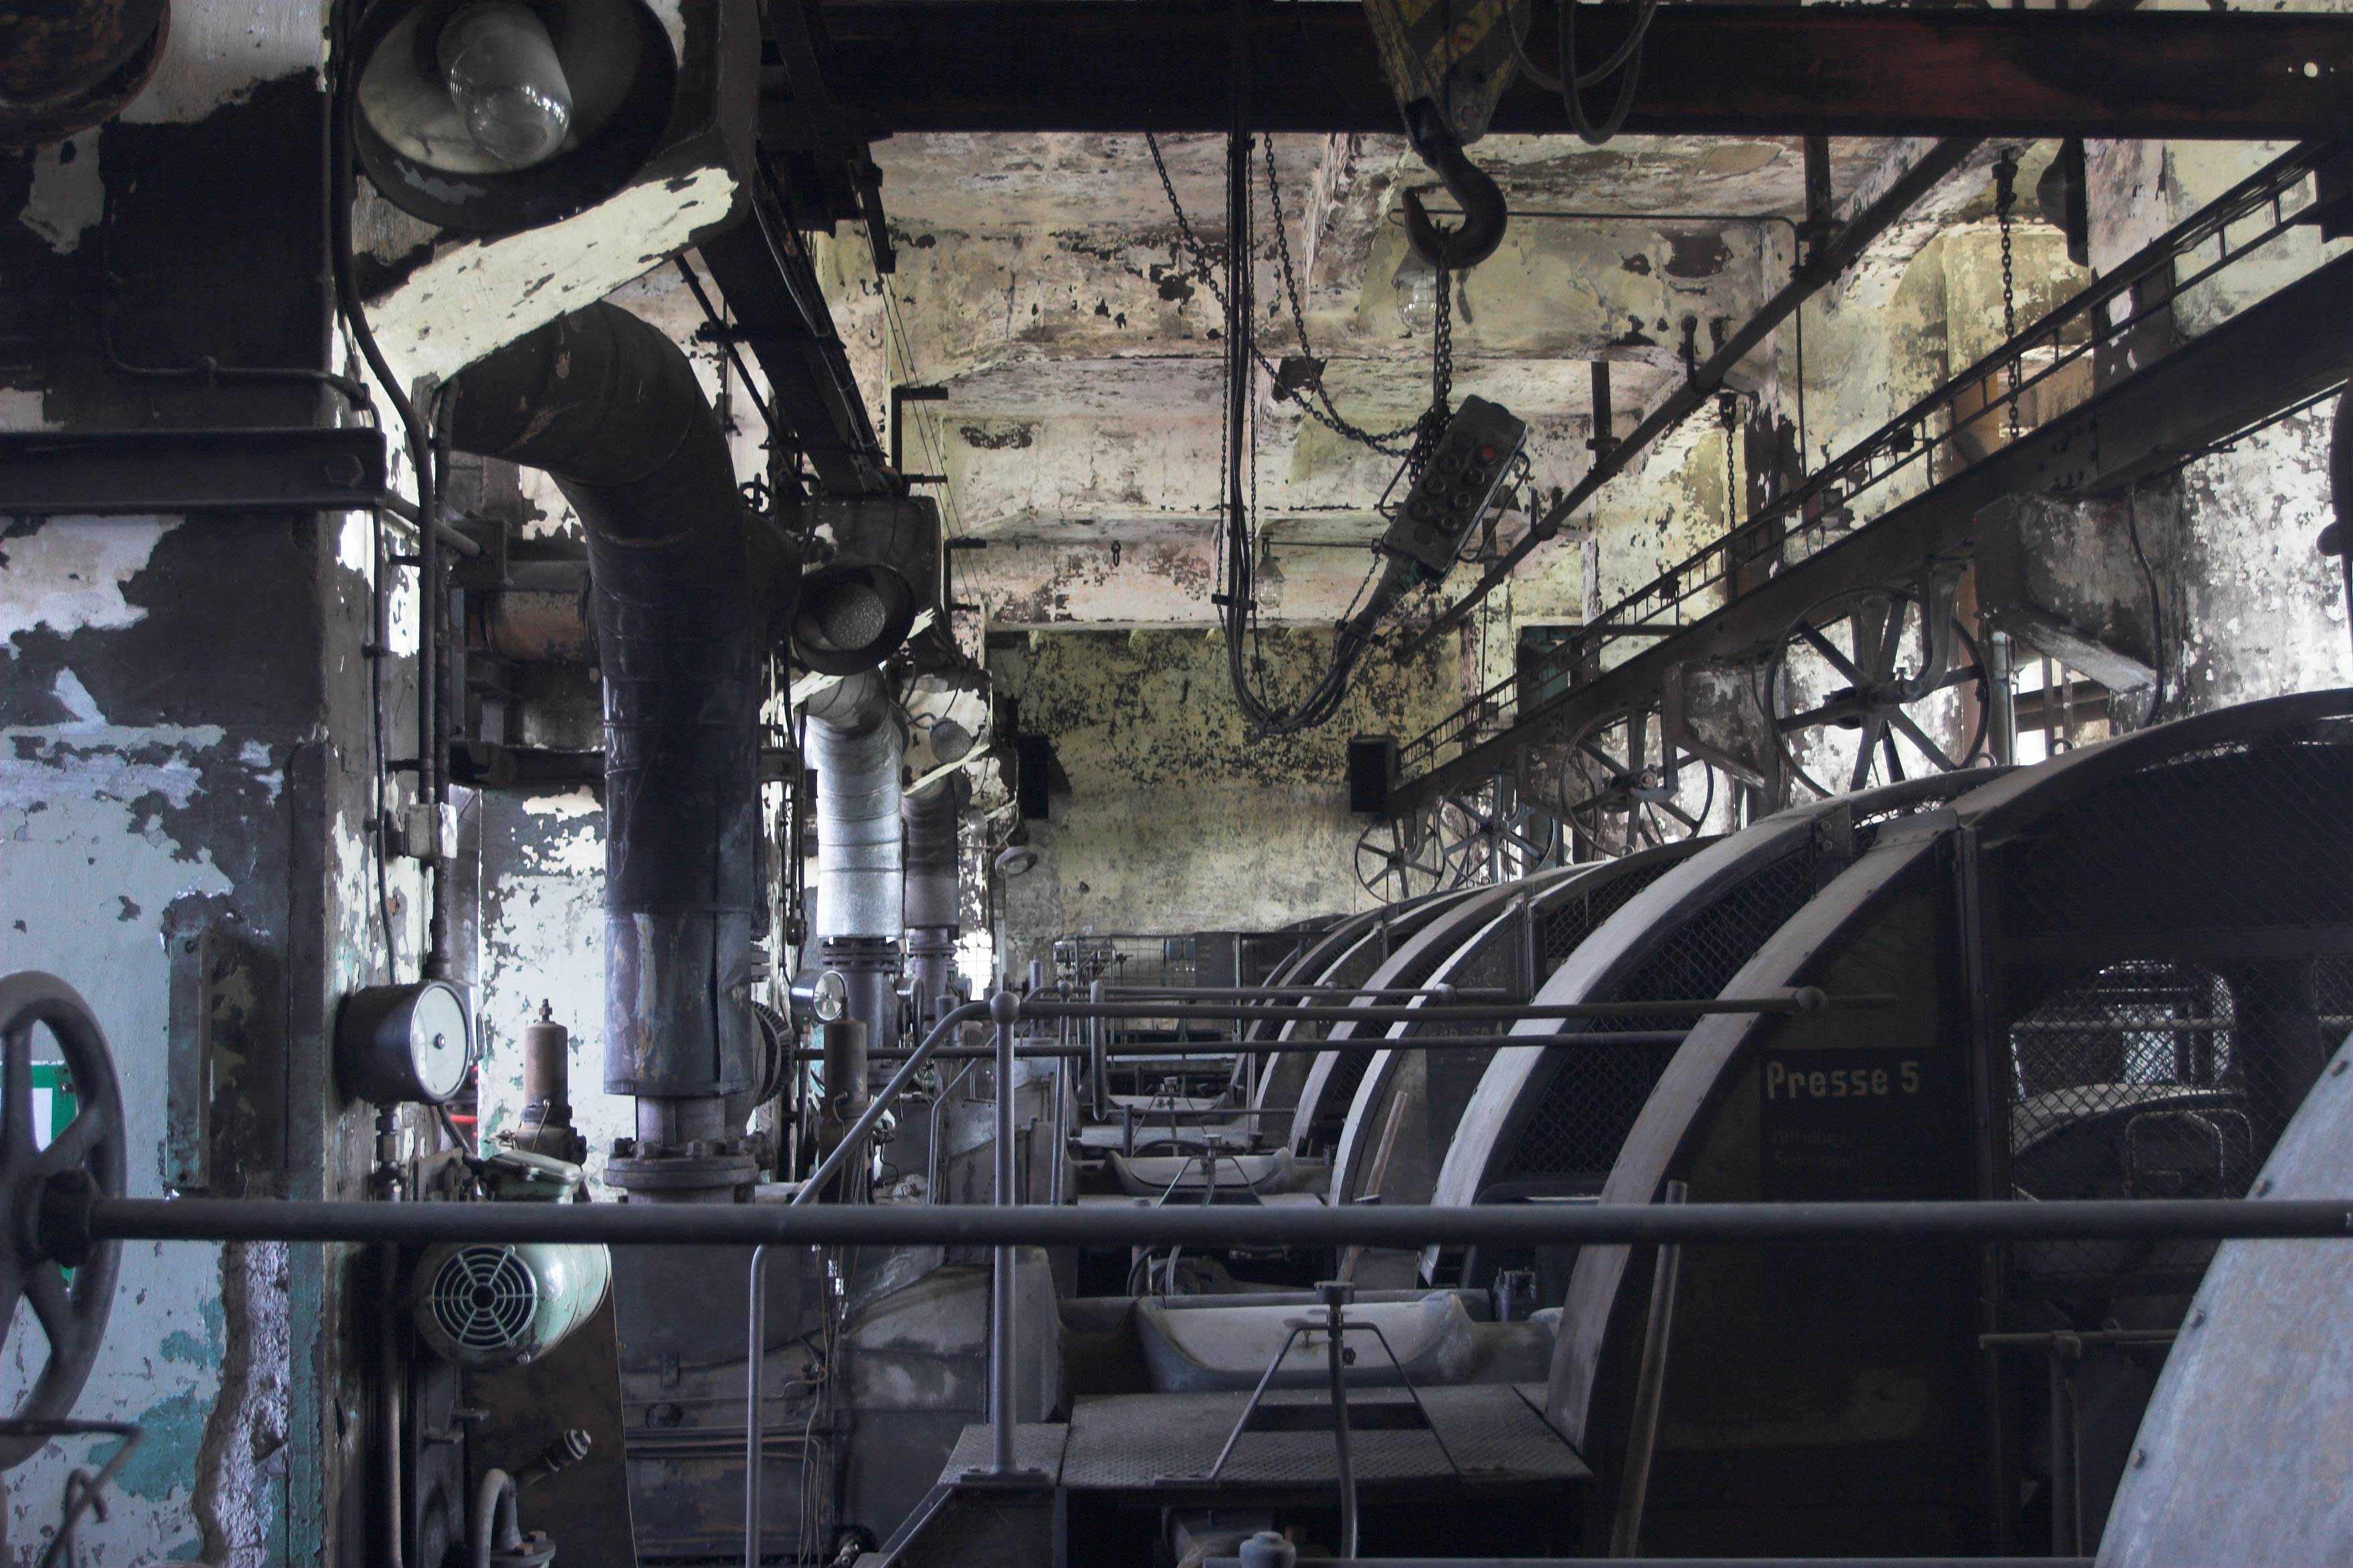 brikettfabrik.jpg